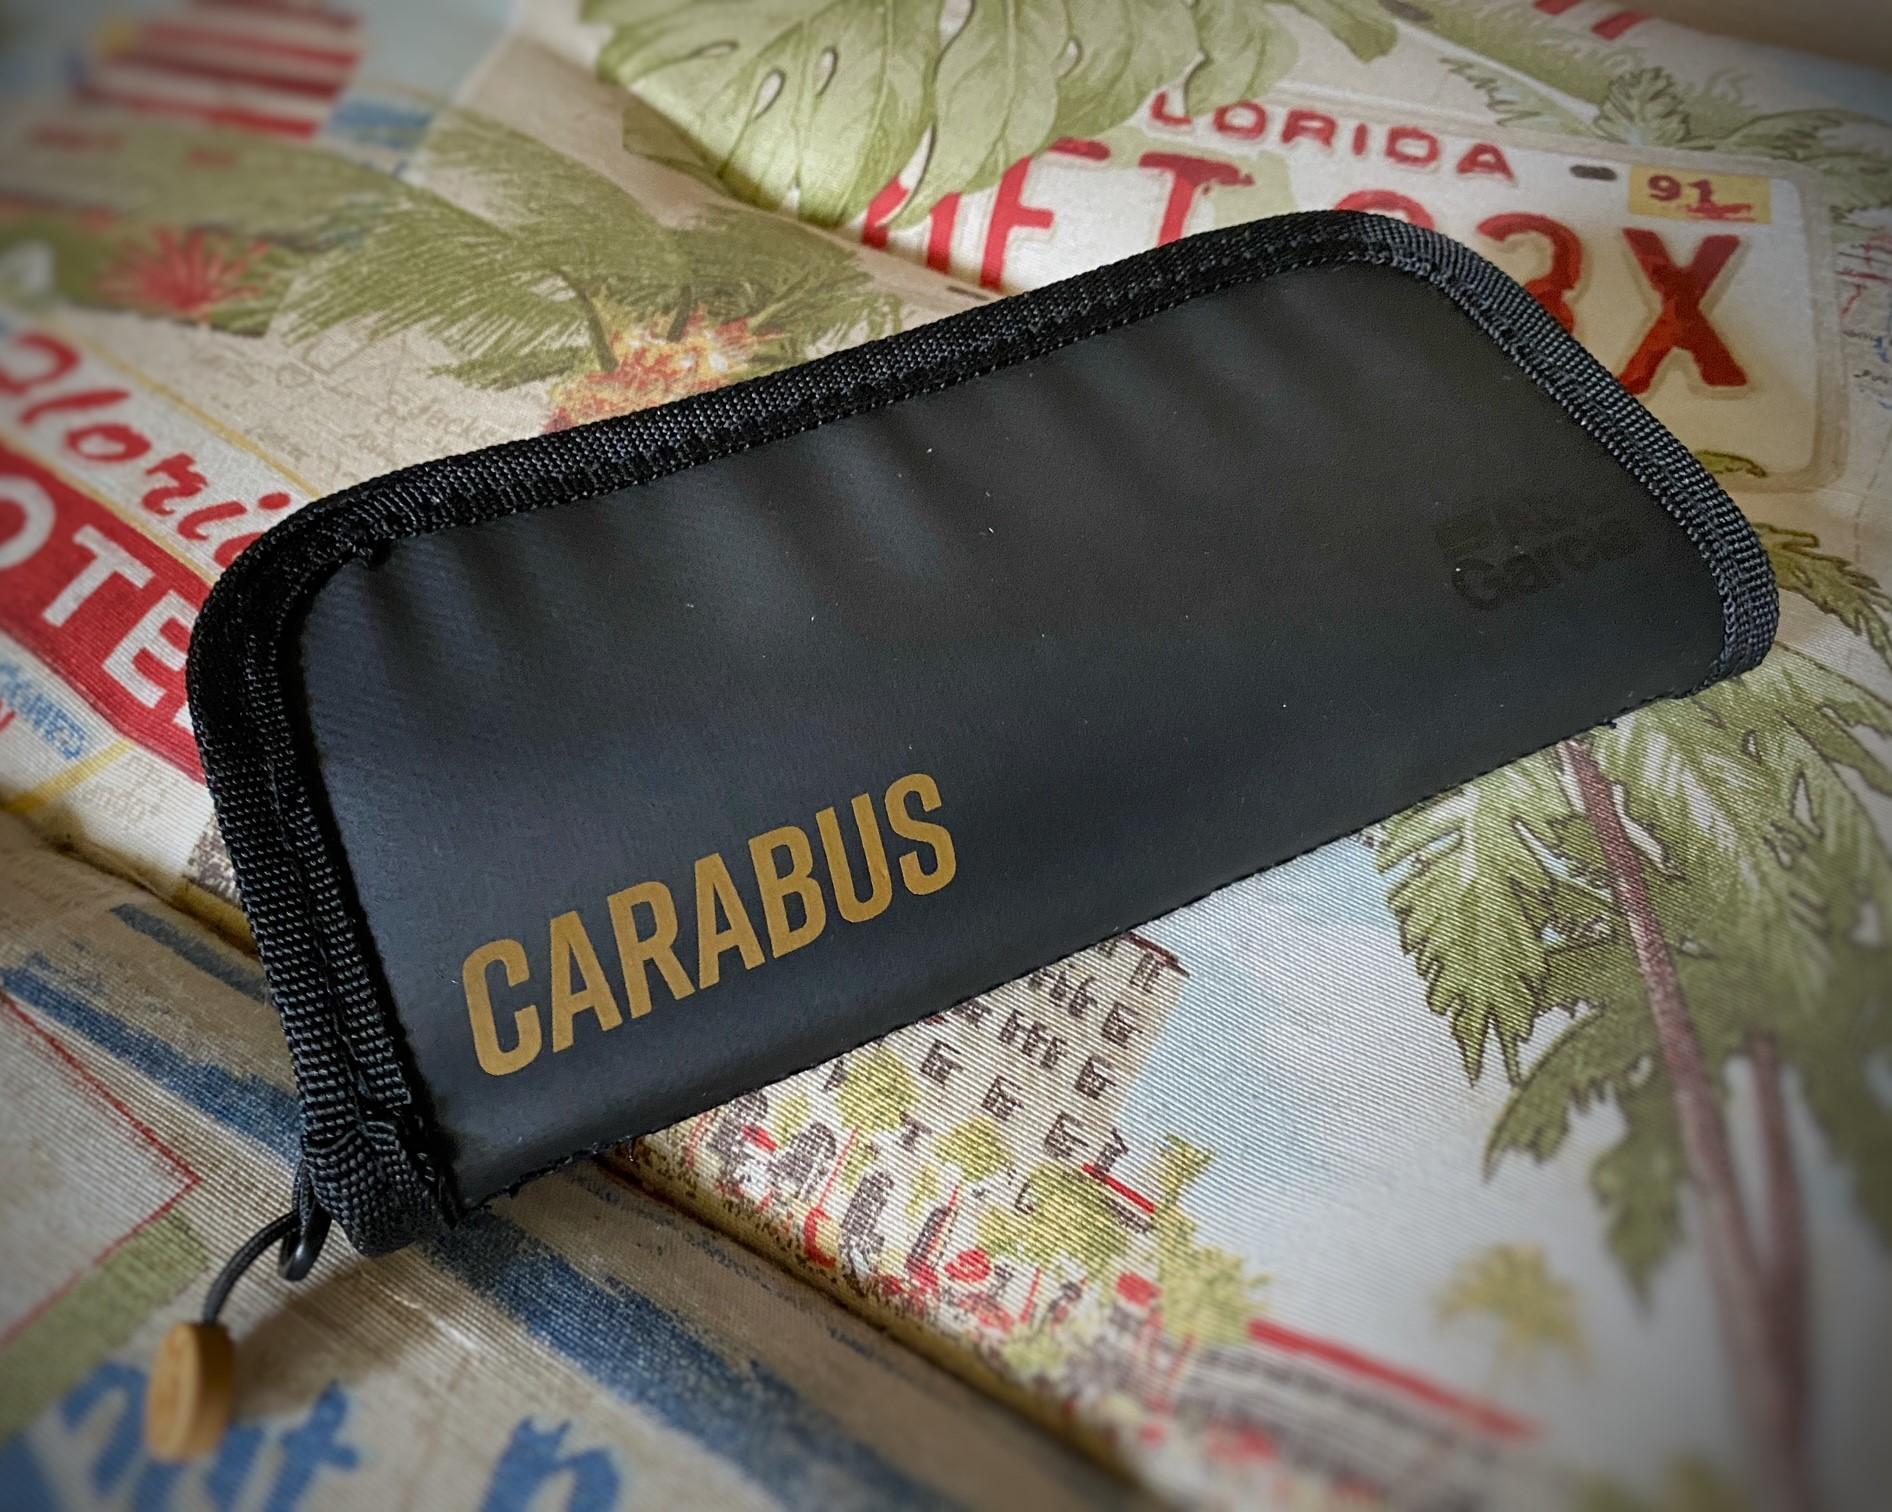 Carabus Tasche 3.jpg